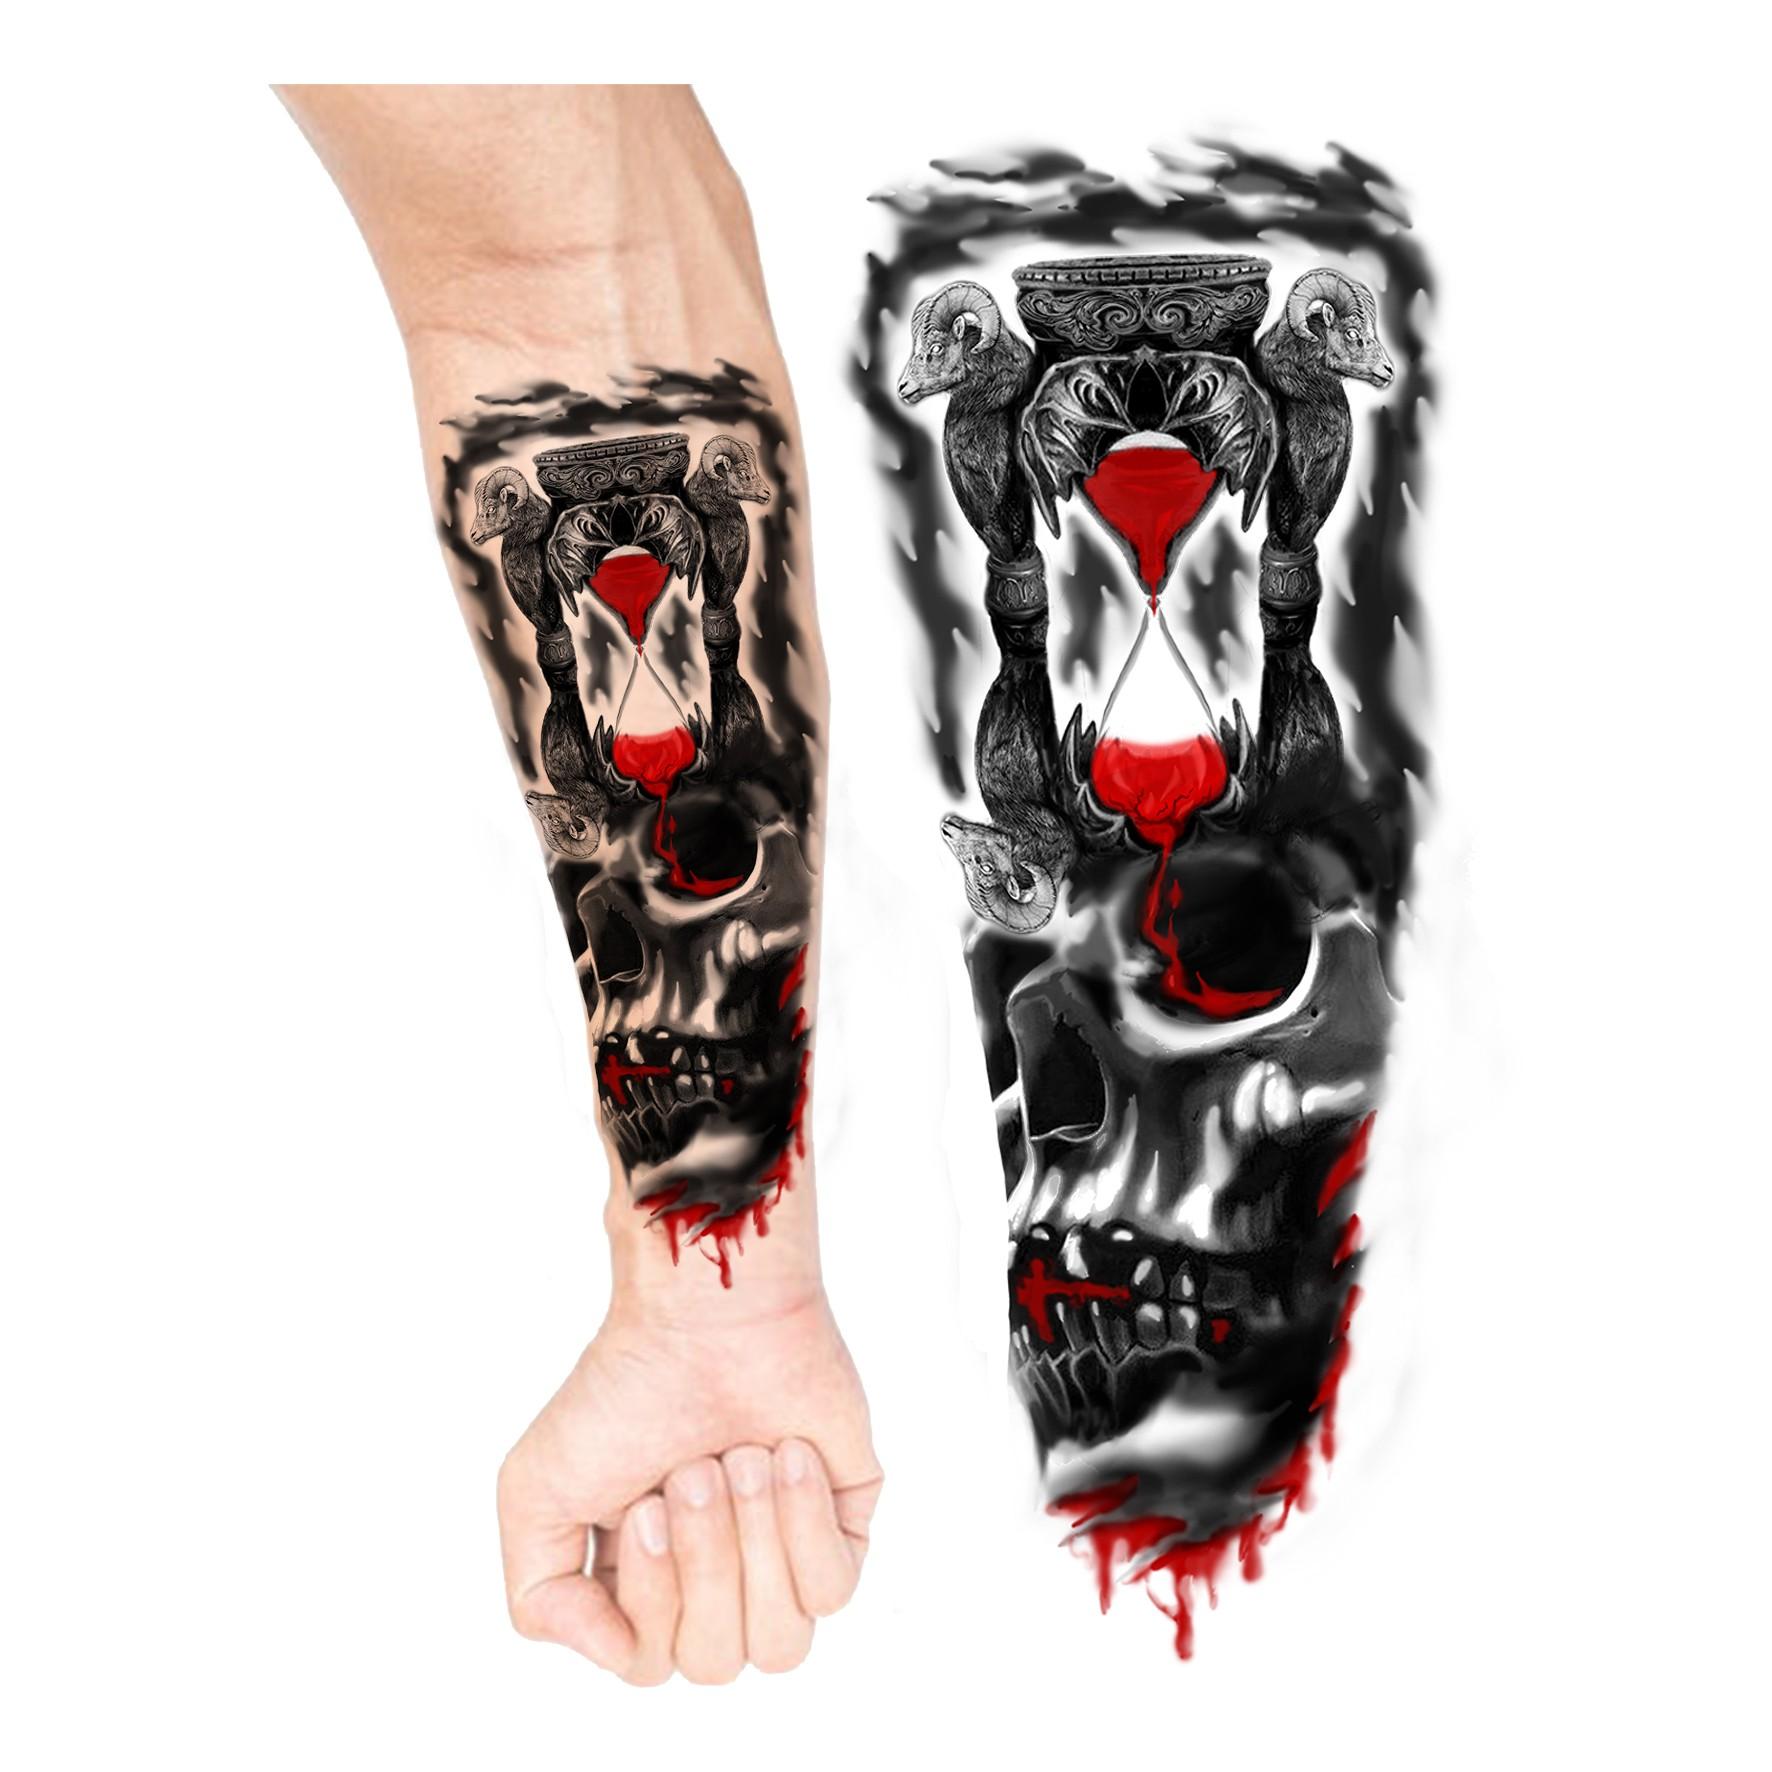 Bonus - For Tattoo contest - hidden_work